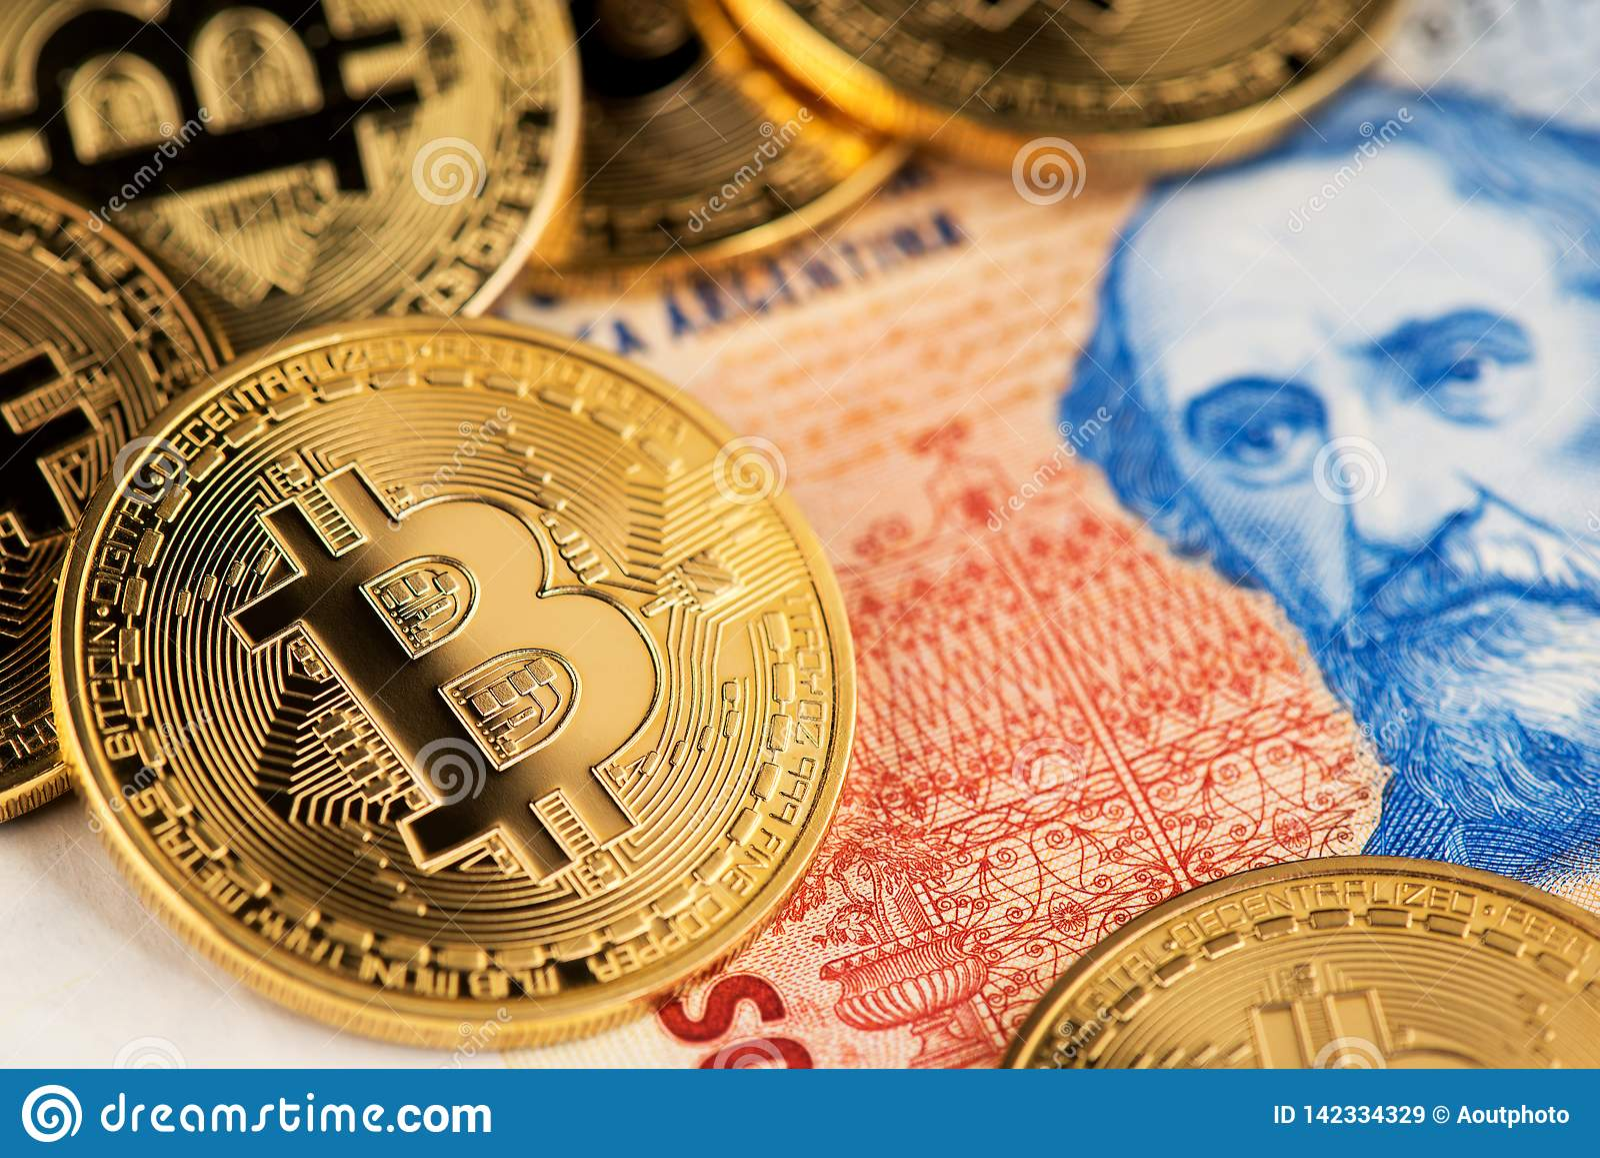 Argentina us bitcoins how binary options brokers make money